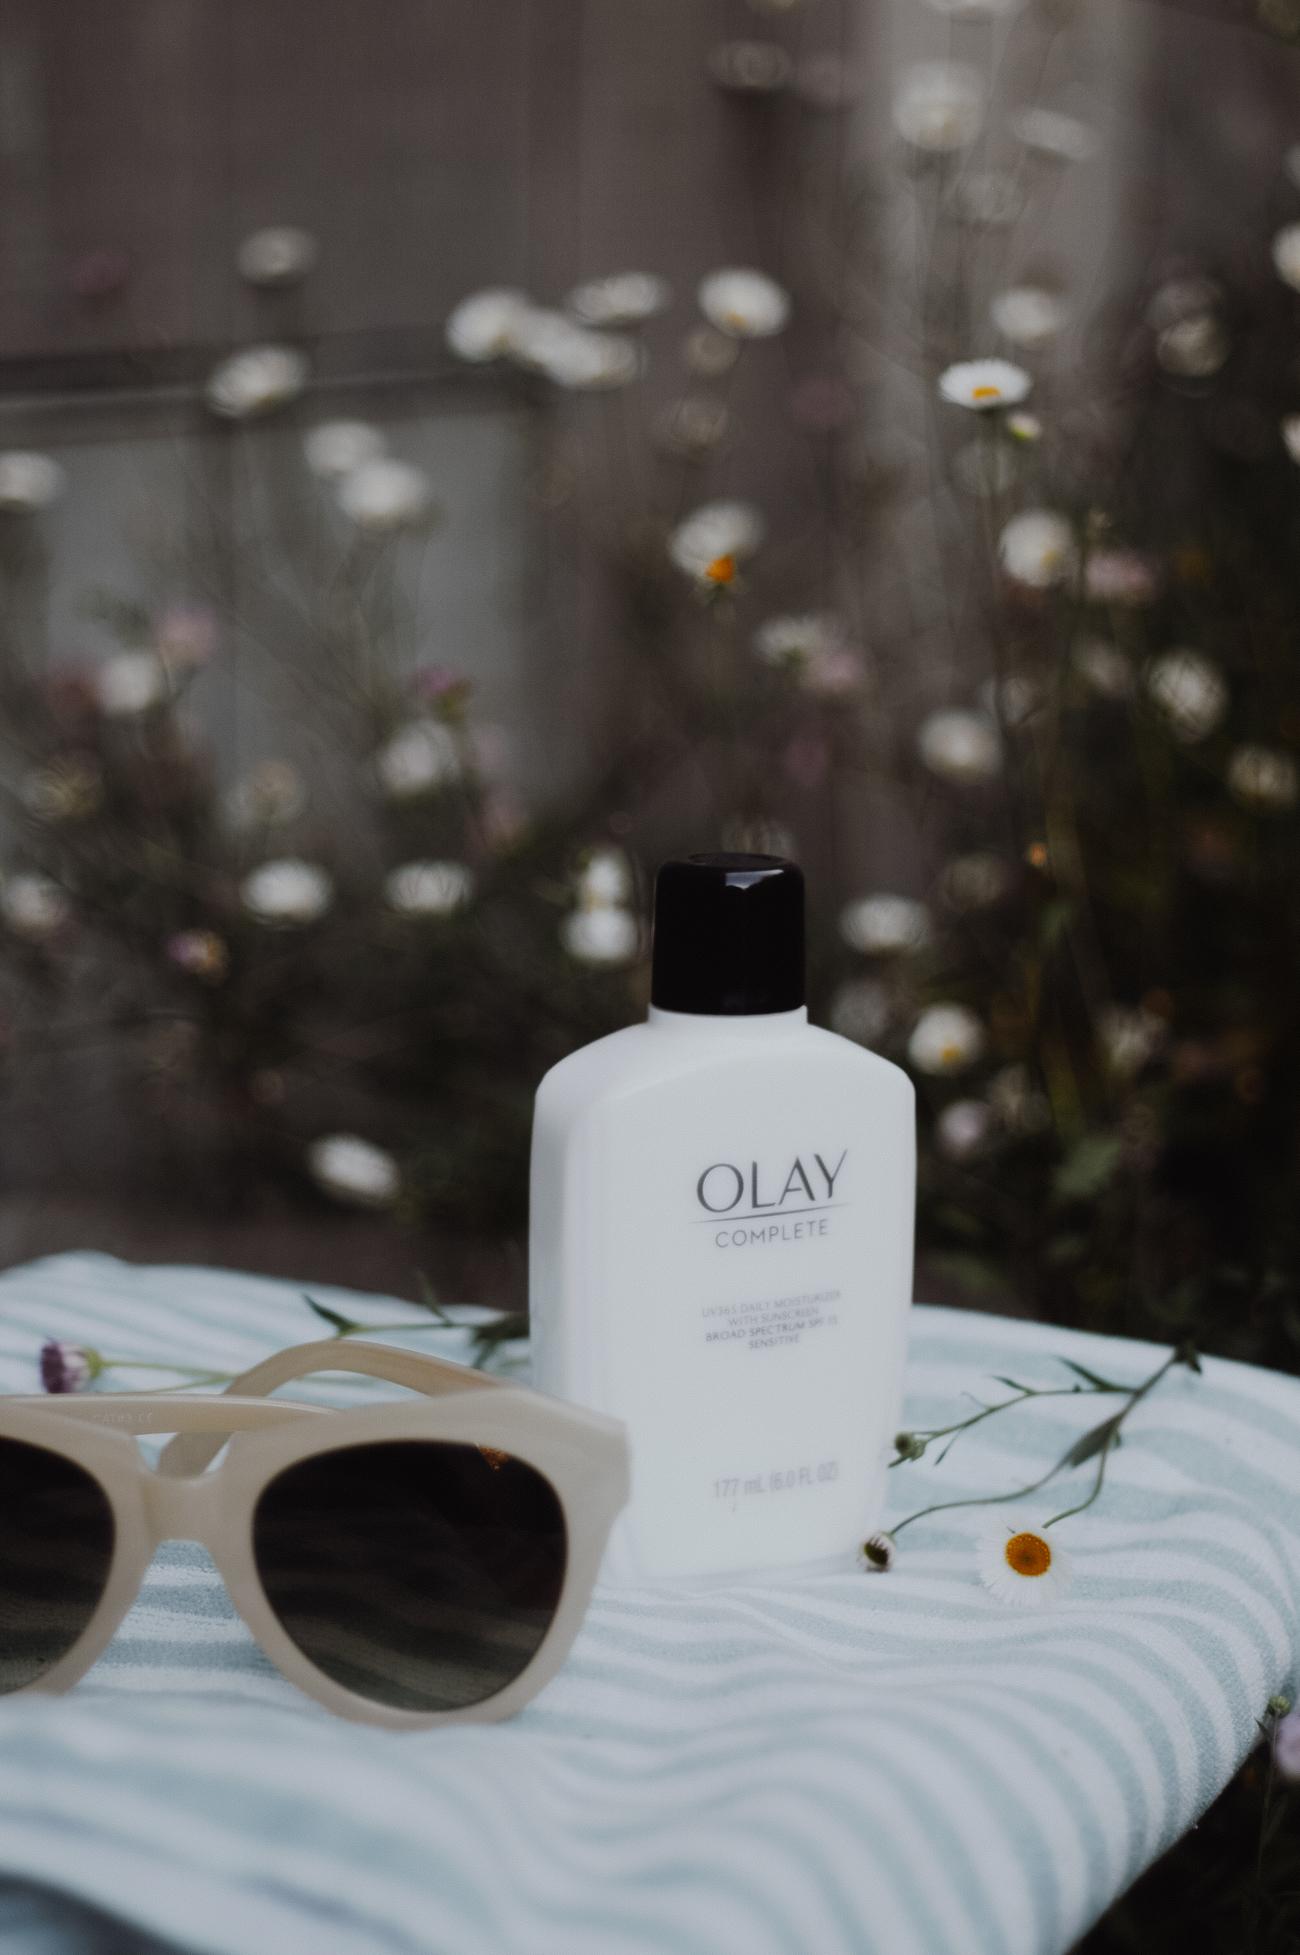 Olay SPF moisturizer blogger review